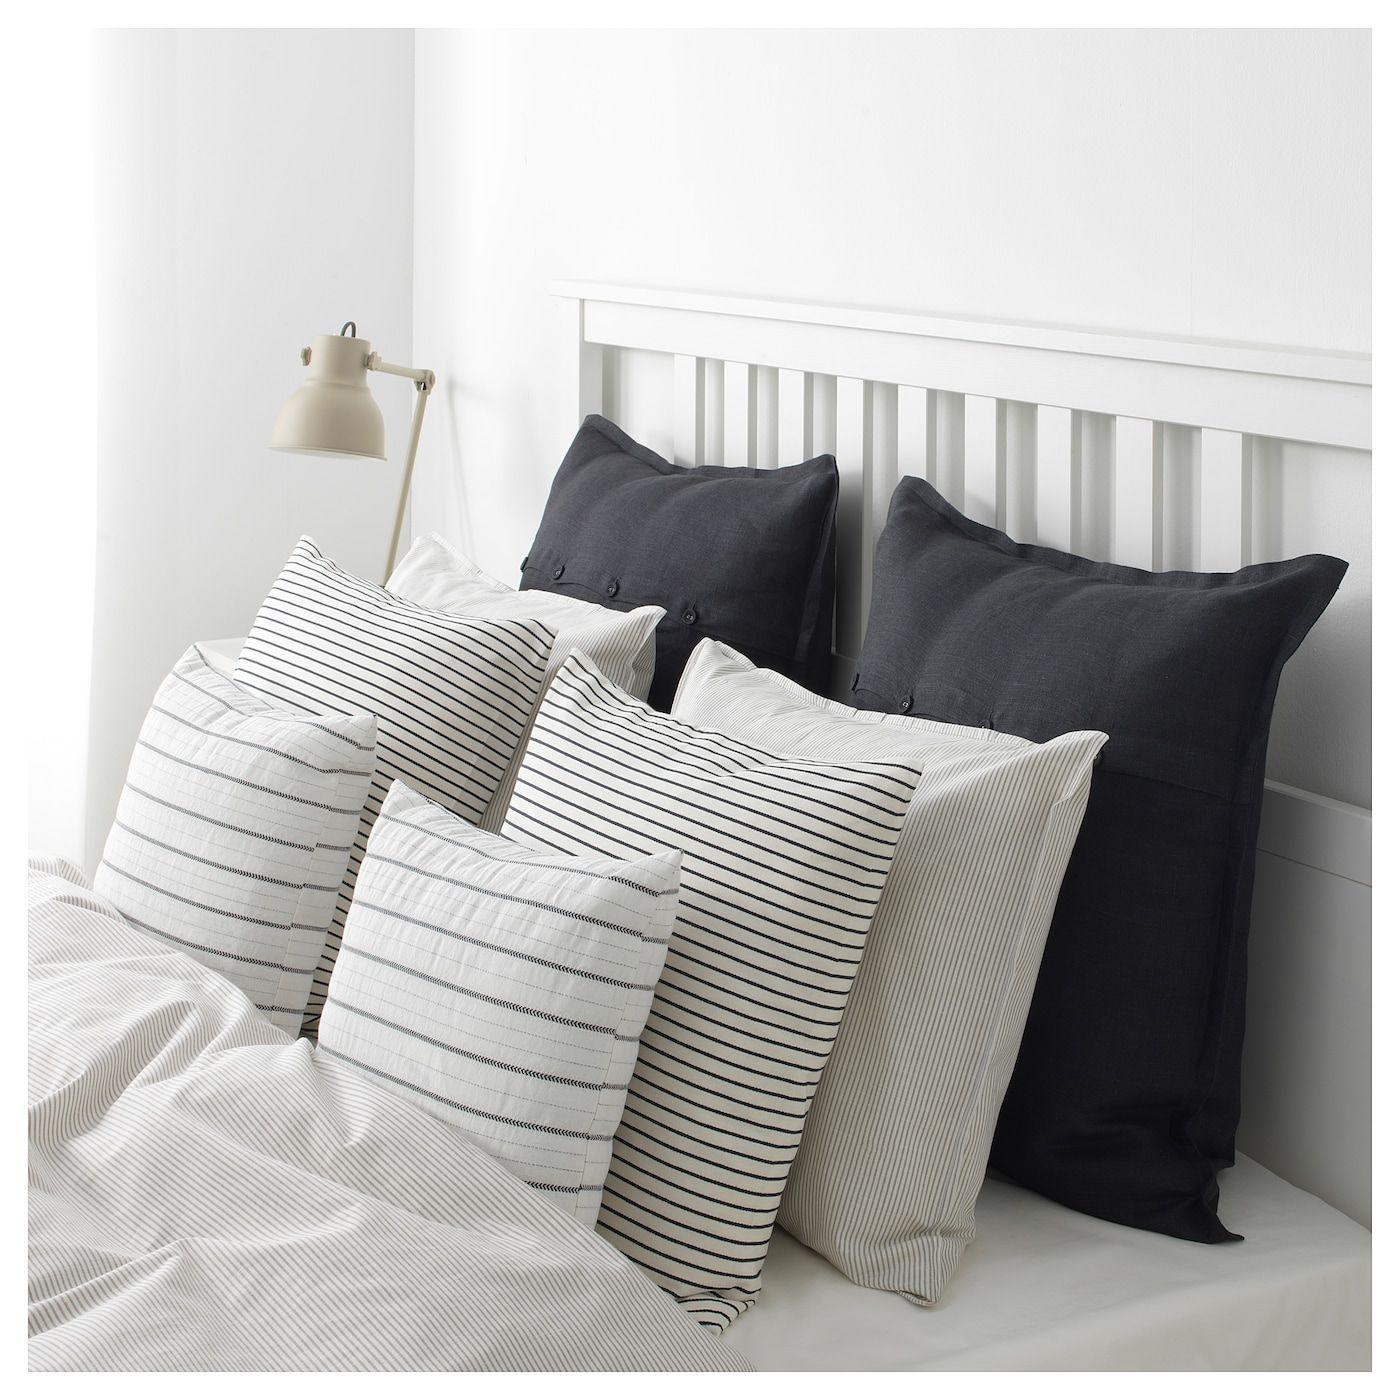 Ingalill Cushion Cover White Dark Gray Stripe Ikea In 2020 Dark Grey Bedding Grey And White Bedding Pinstripe Bedding